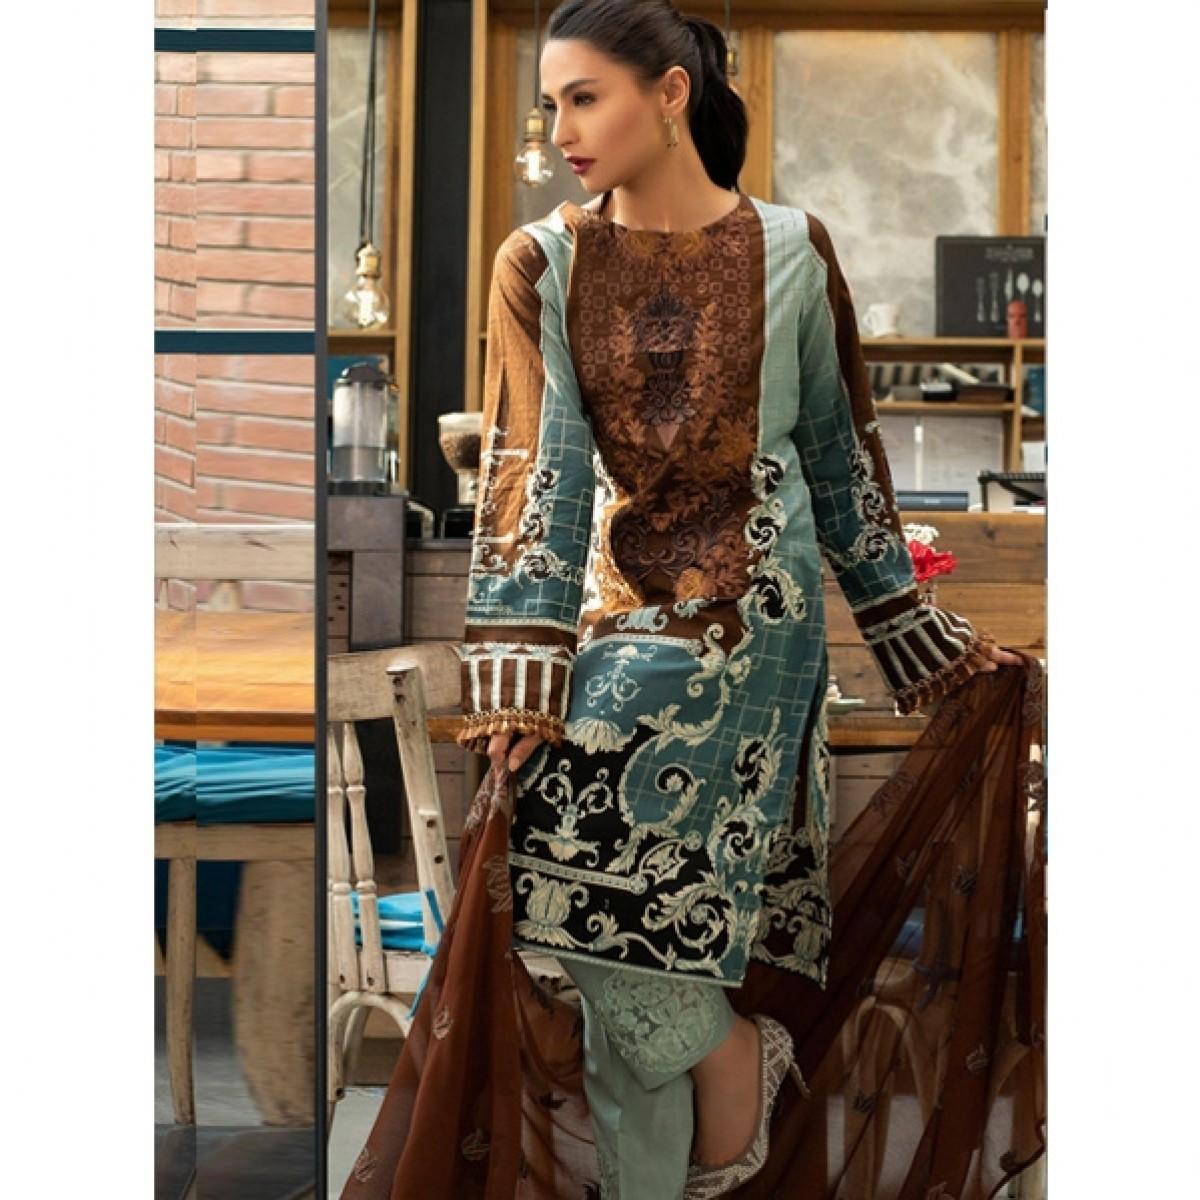 db5d180157 Salitex Shades Summer 2019 3 Piece Price in Pakistan | Buy Salitex Shades Collection  2019 (WK-262B) | iShopping.pk